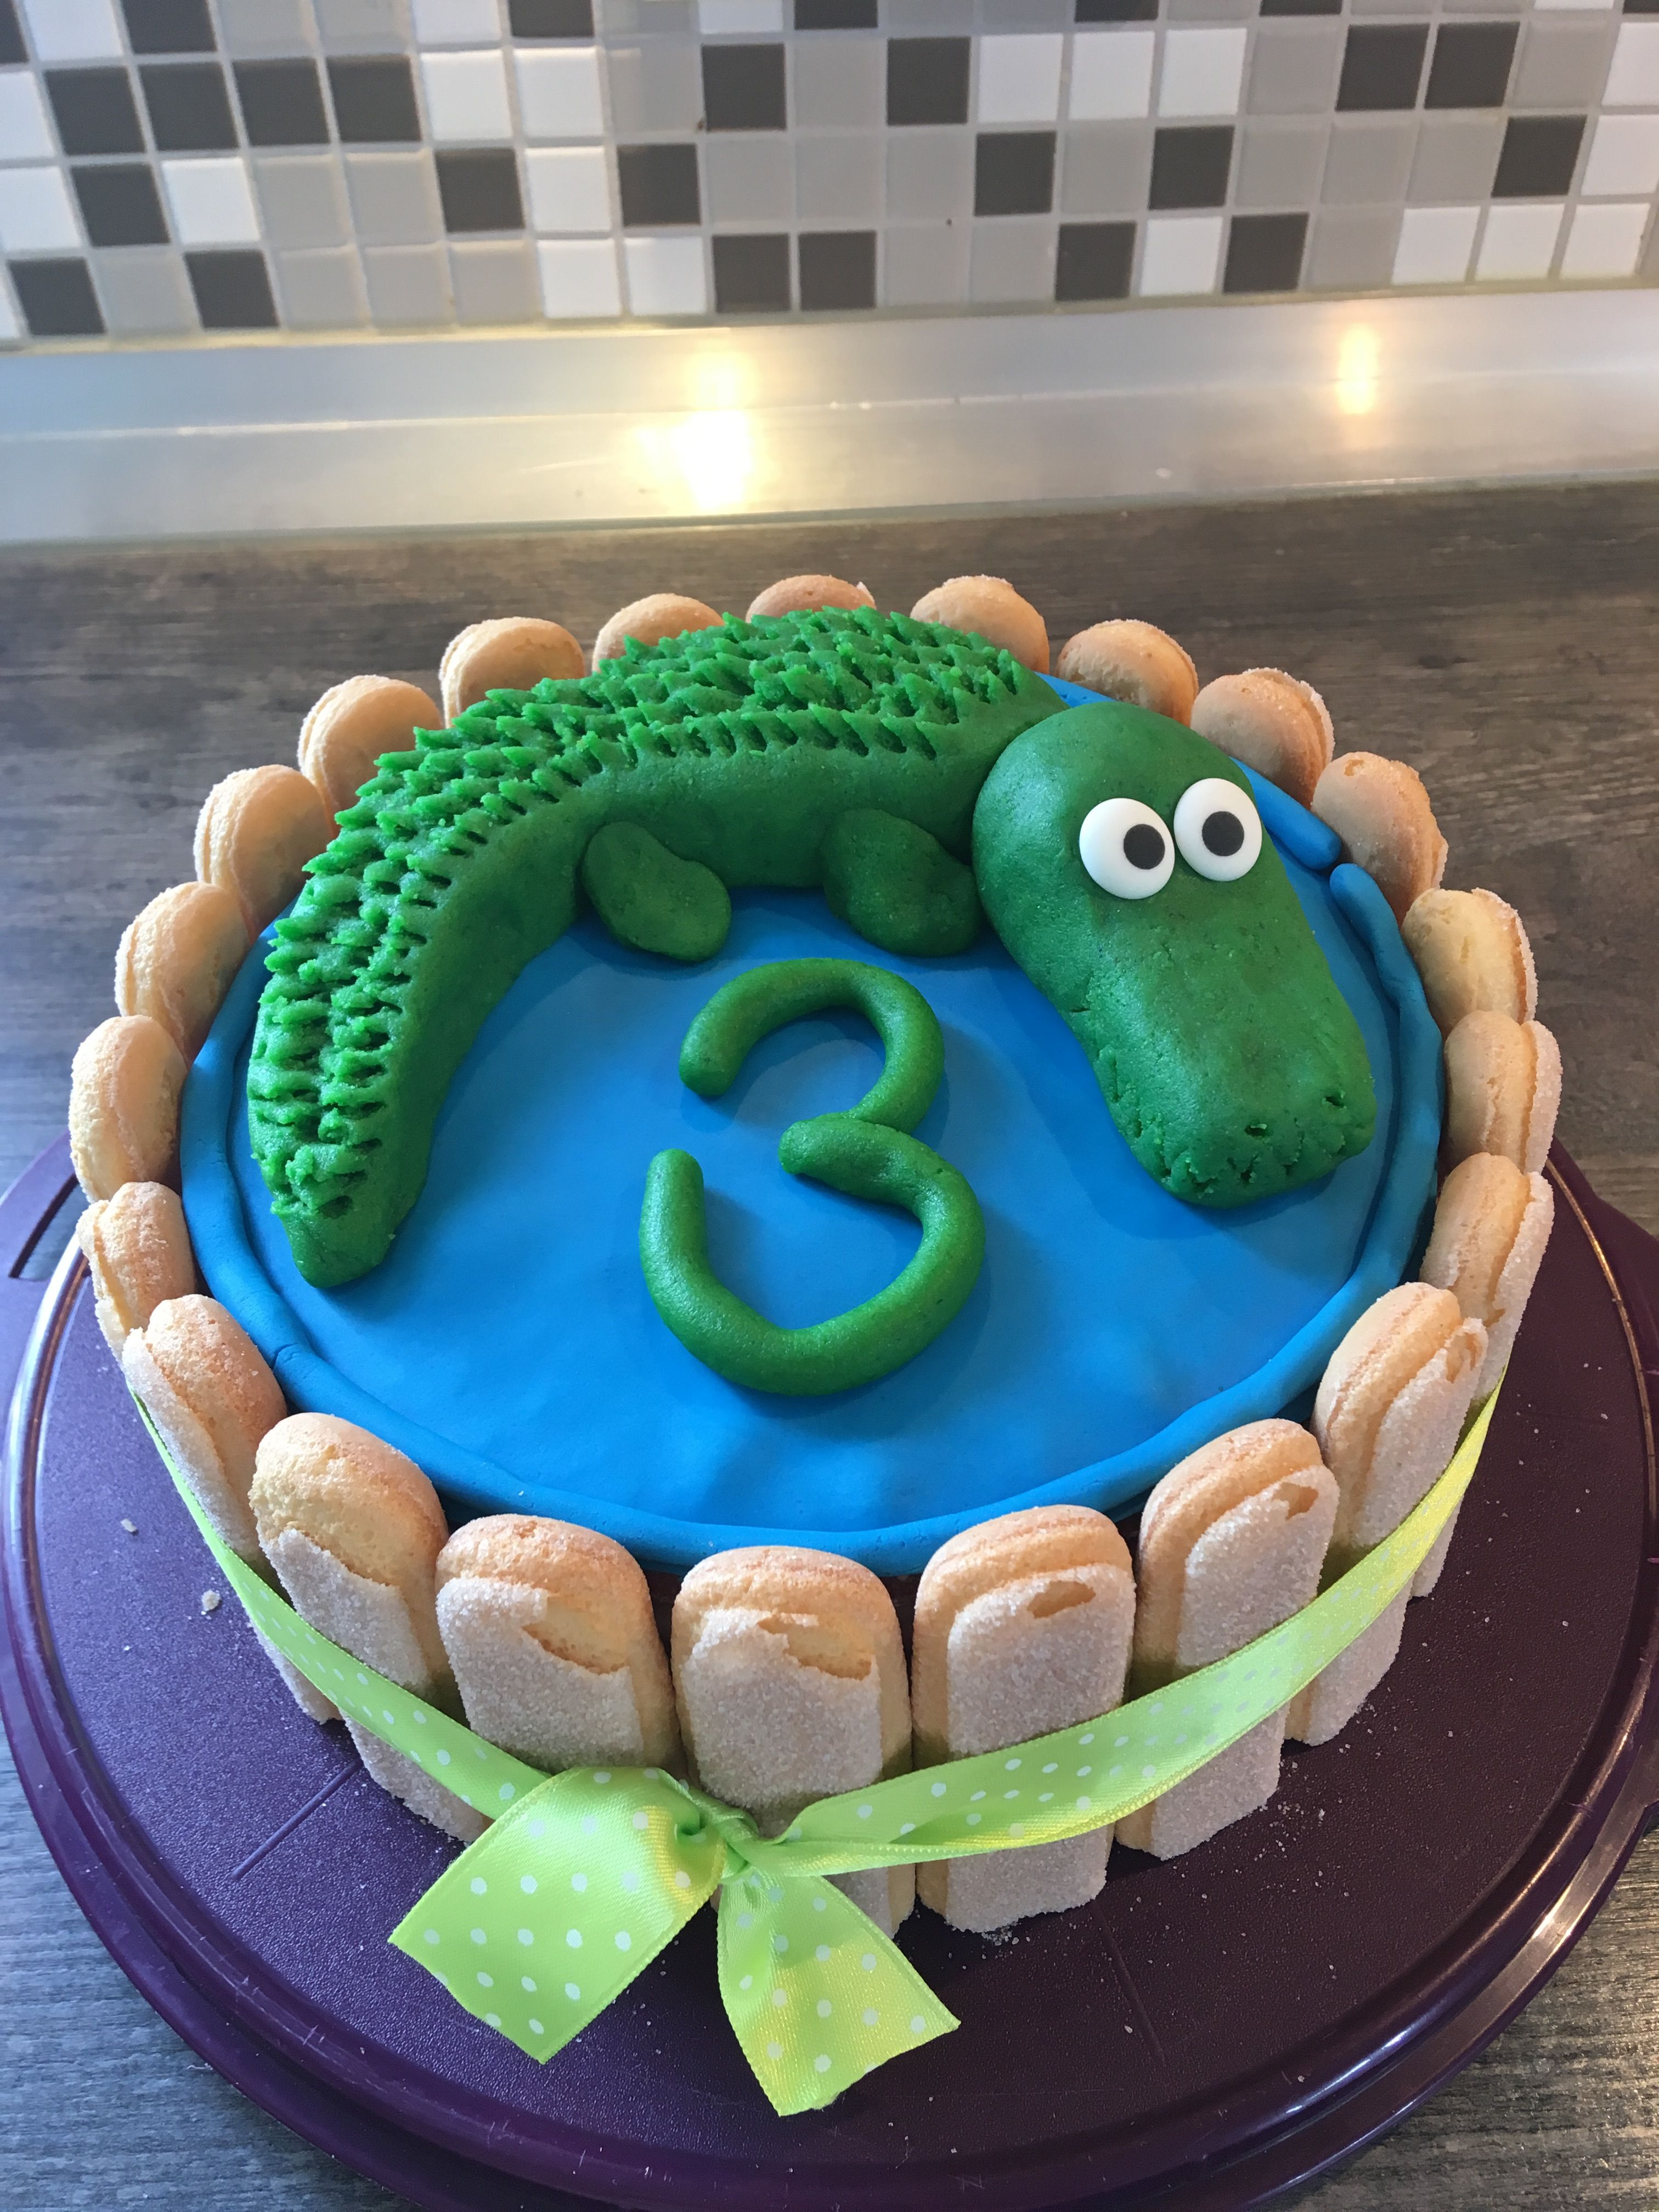 Kindergeburtstag Krokodil Torte Dritter Geburtstag Kuchen Kindergeburtstag Krokodil Kuchen Kindergeburtstage